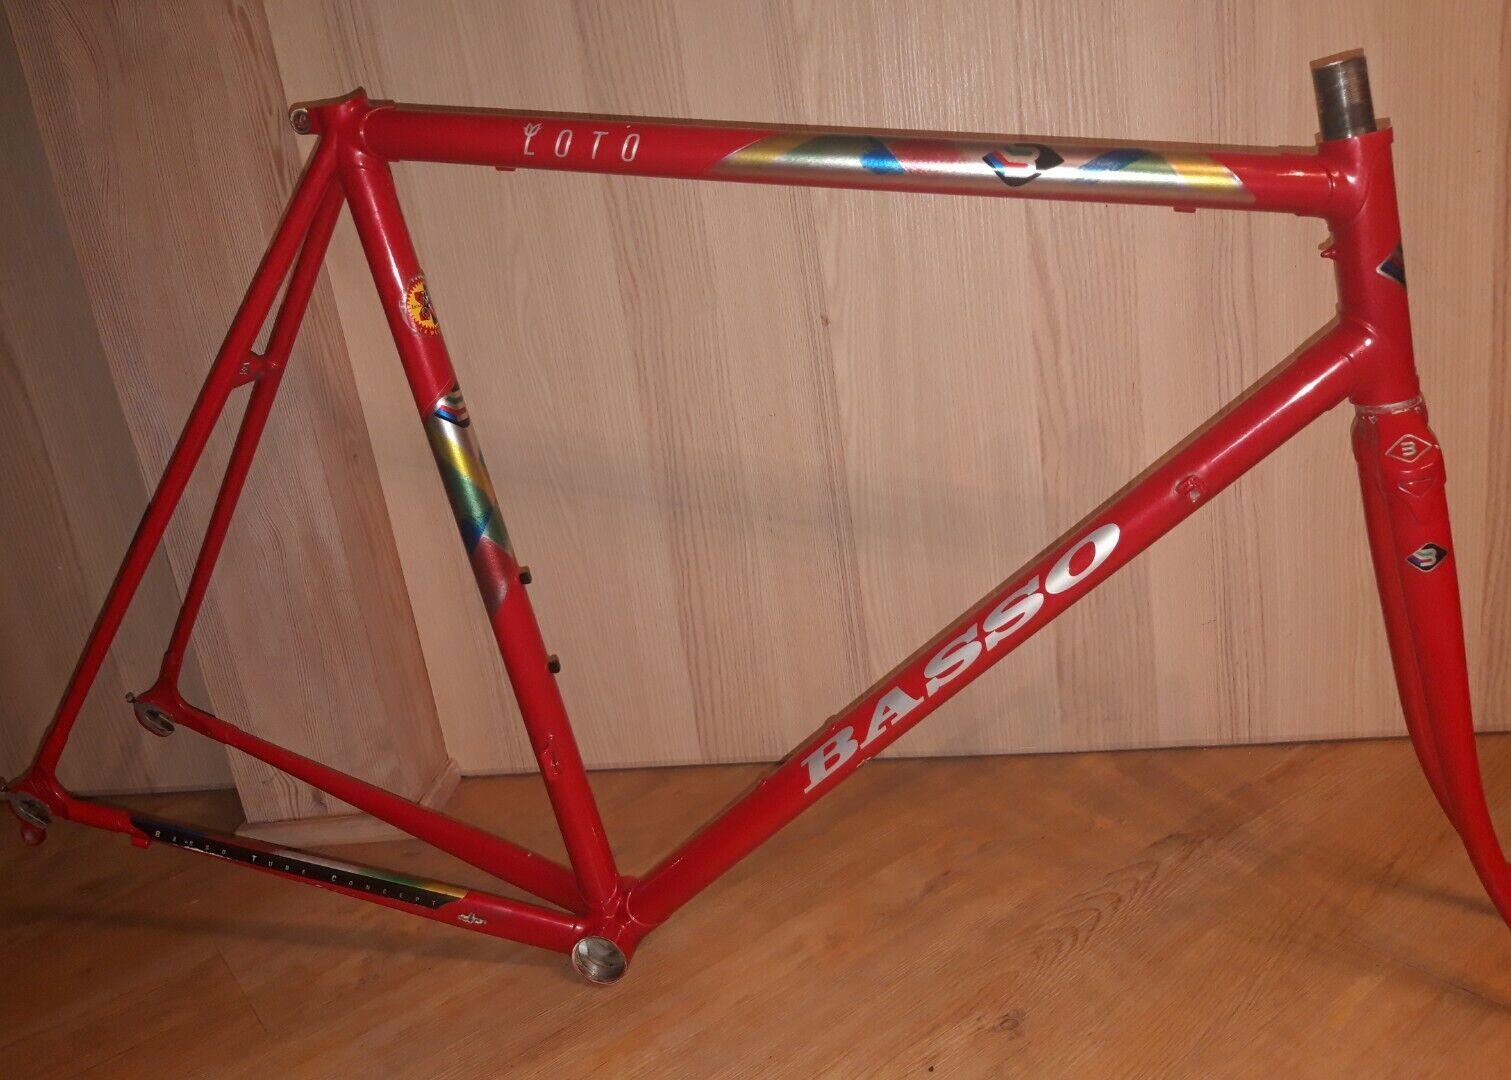 Basso Loto Stahlrahmen Steel frame,no colnago